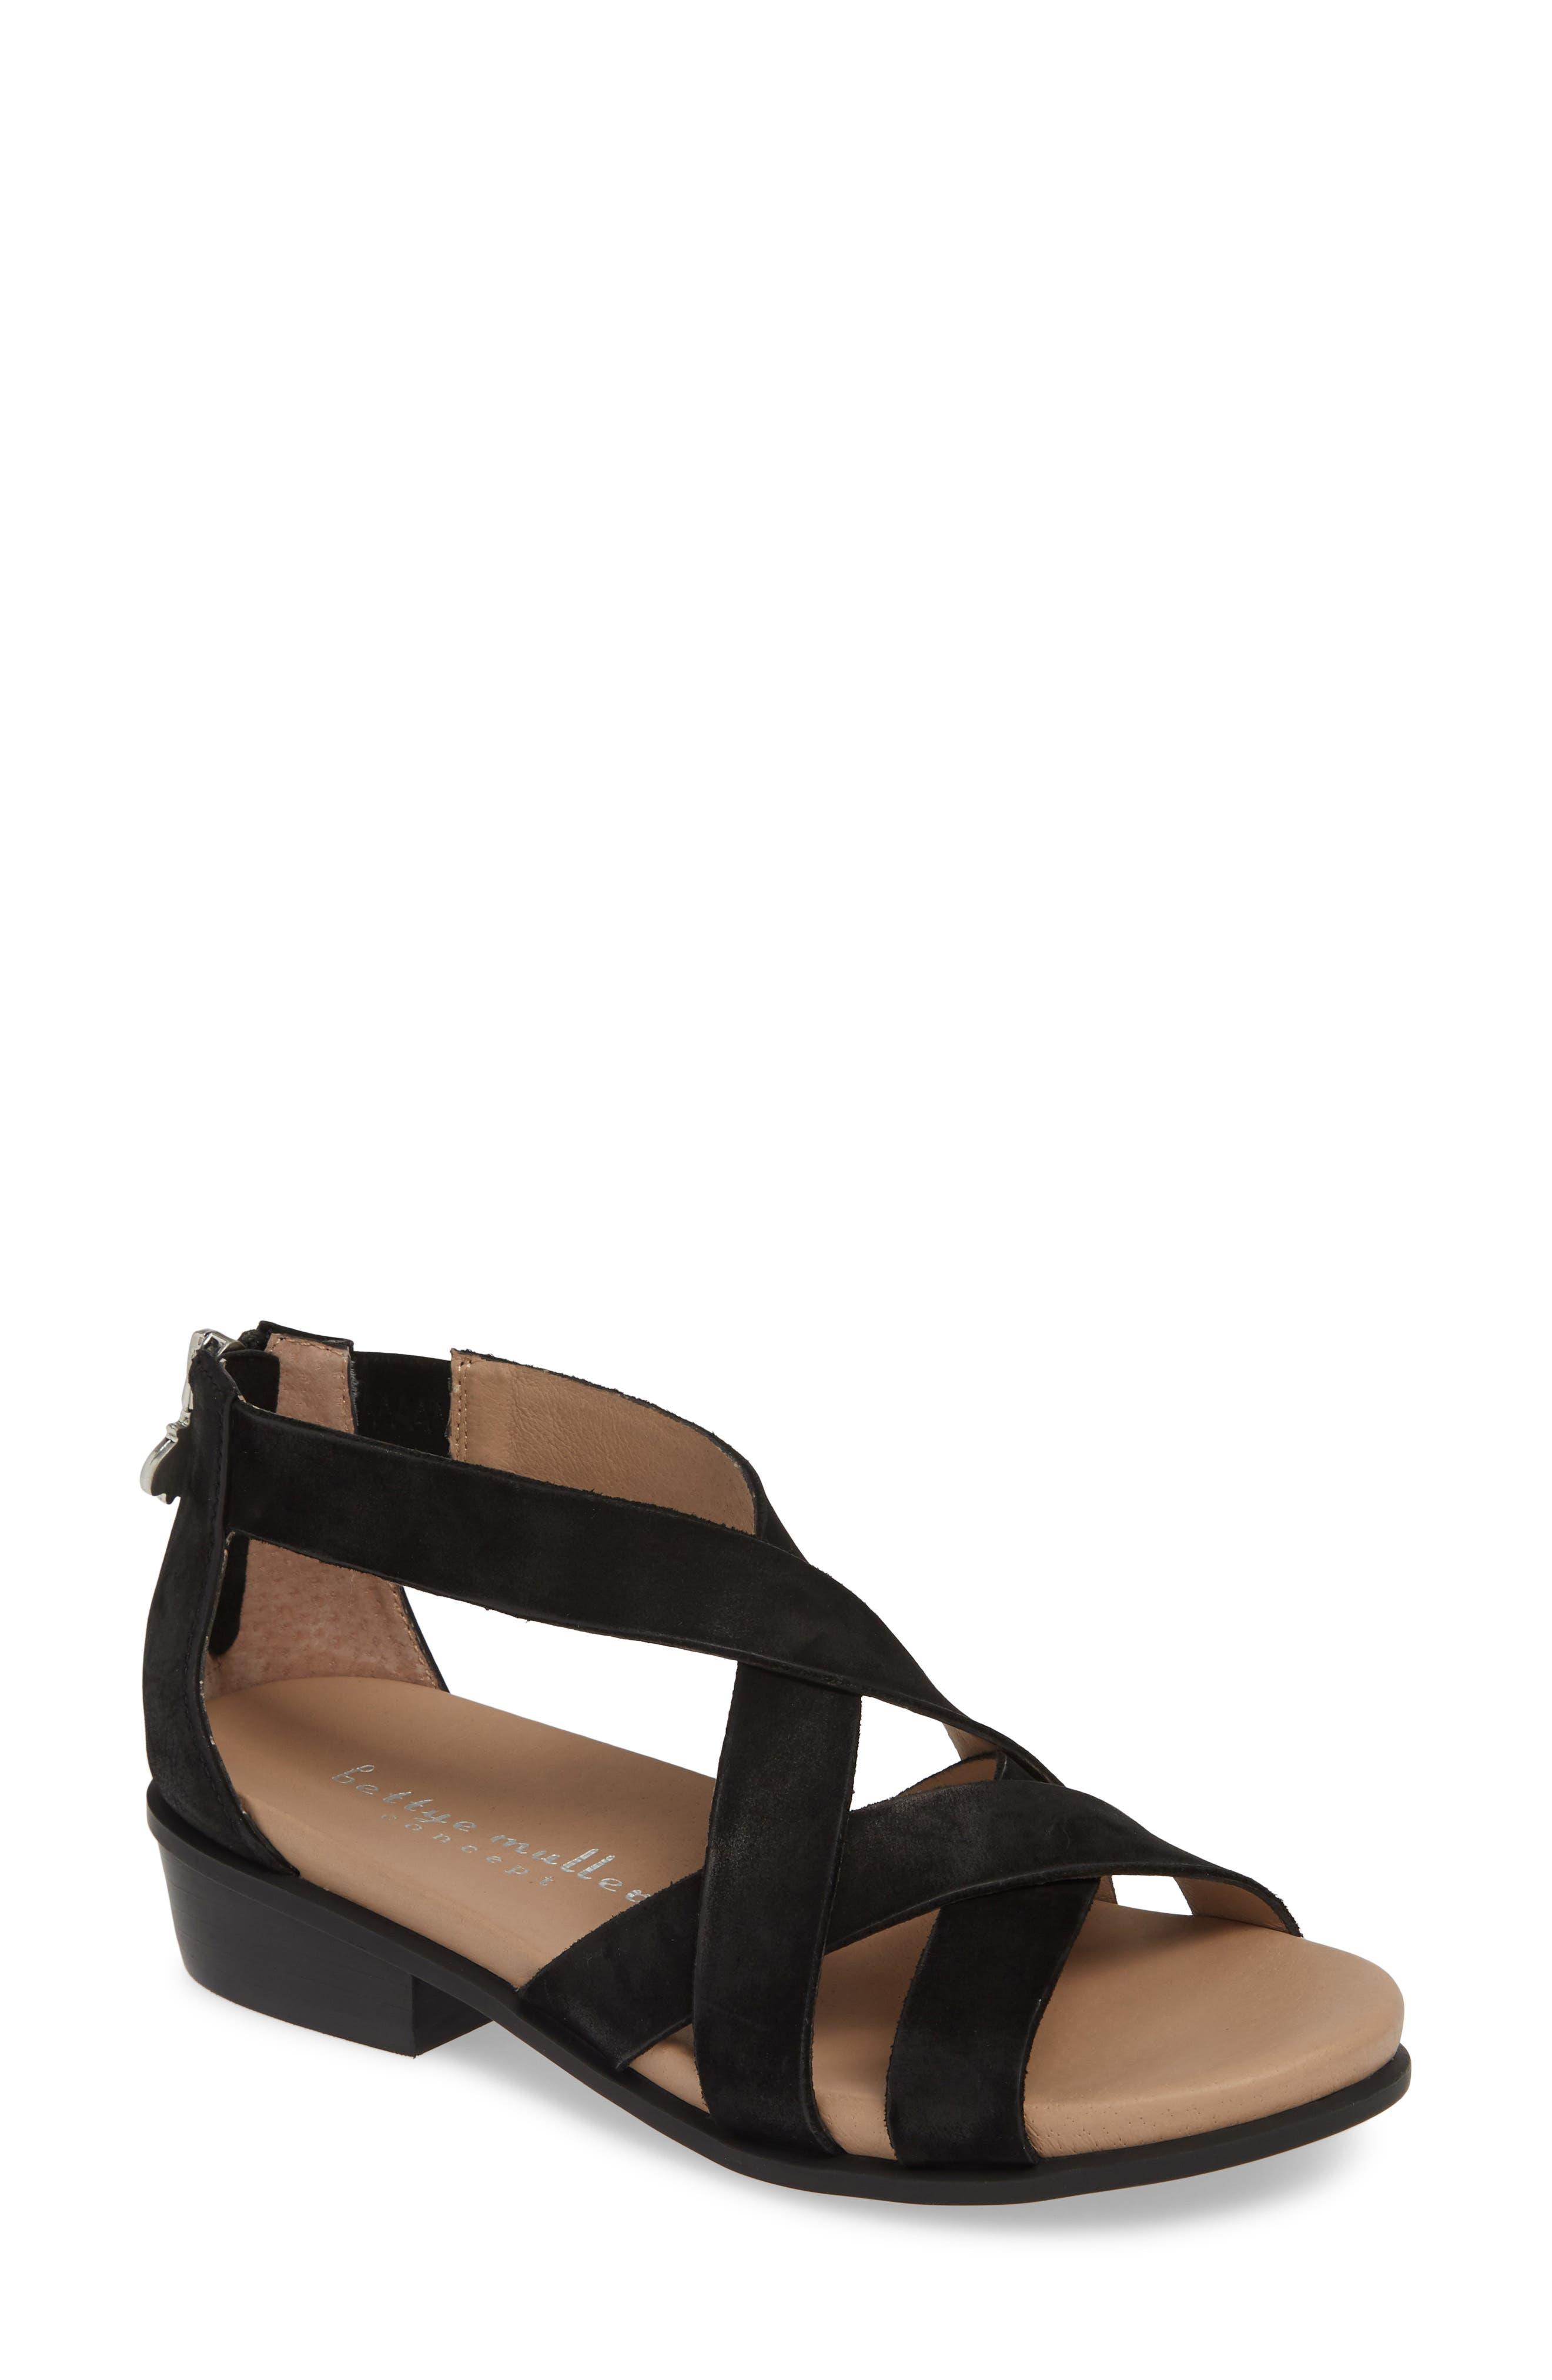 Bettye Muller Concepts Banyan Sandal, Black